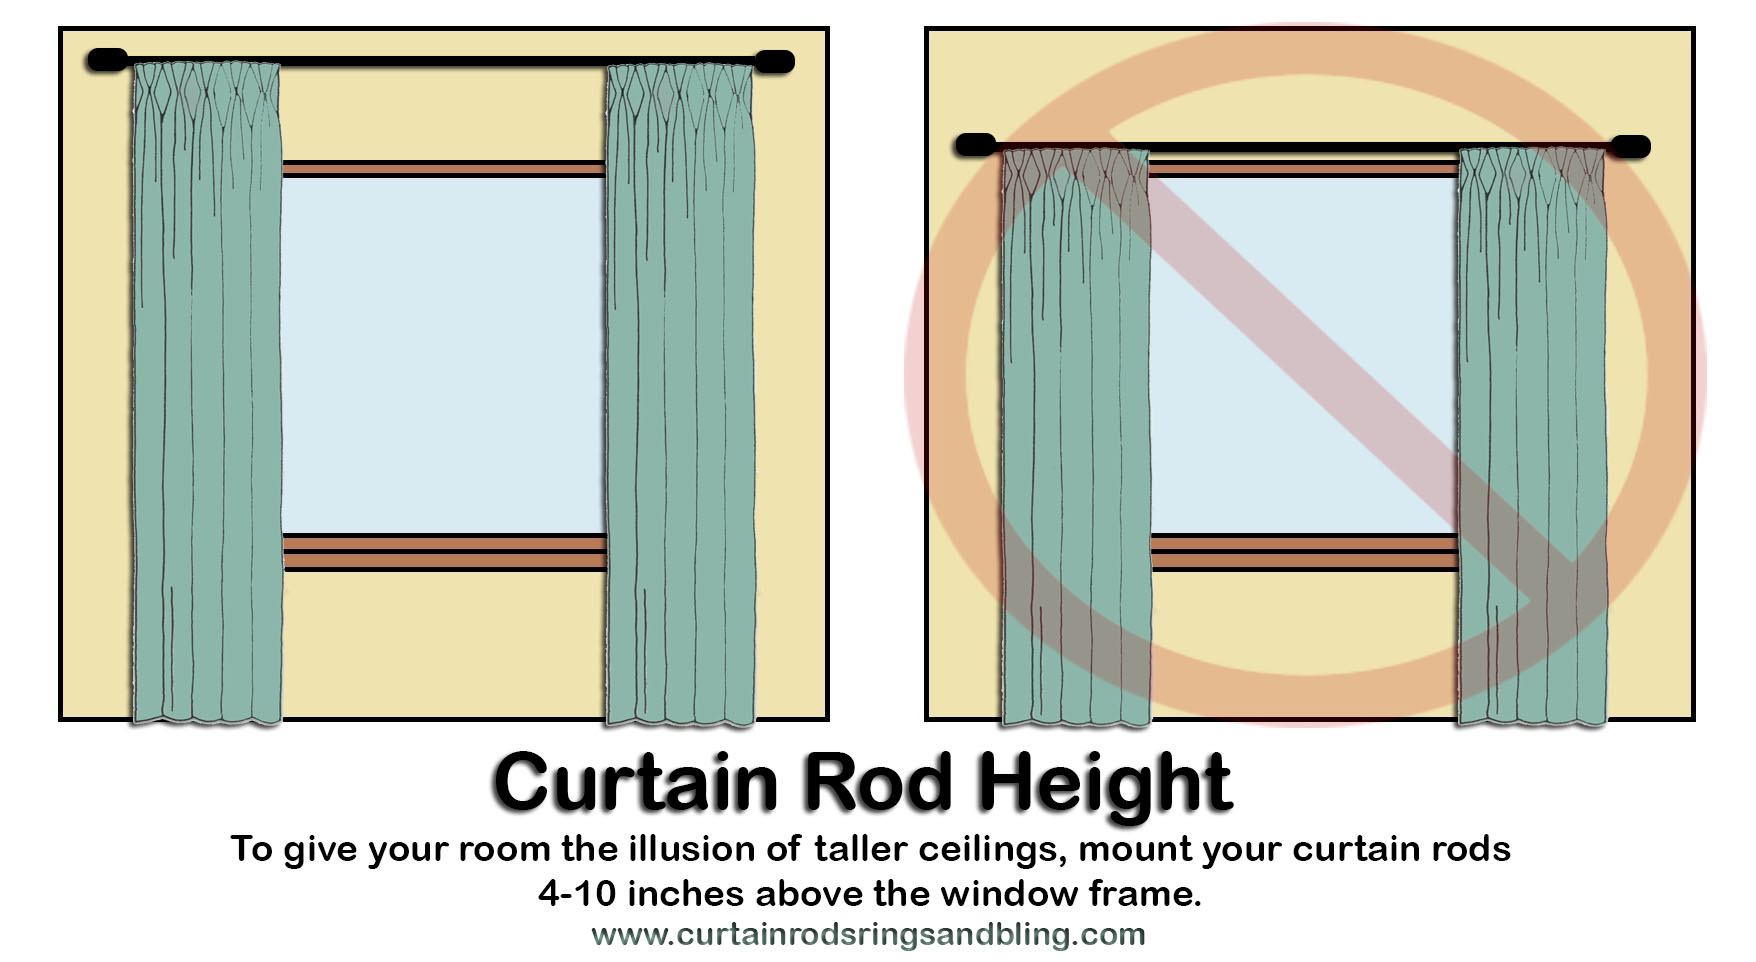 mount curtain rods height abda abda